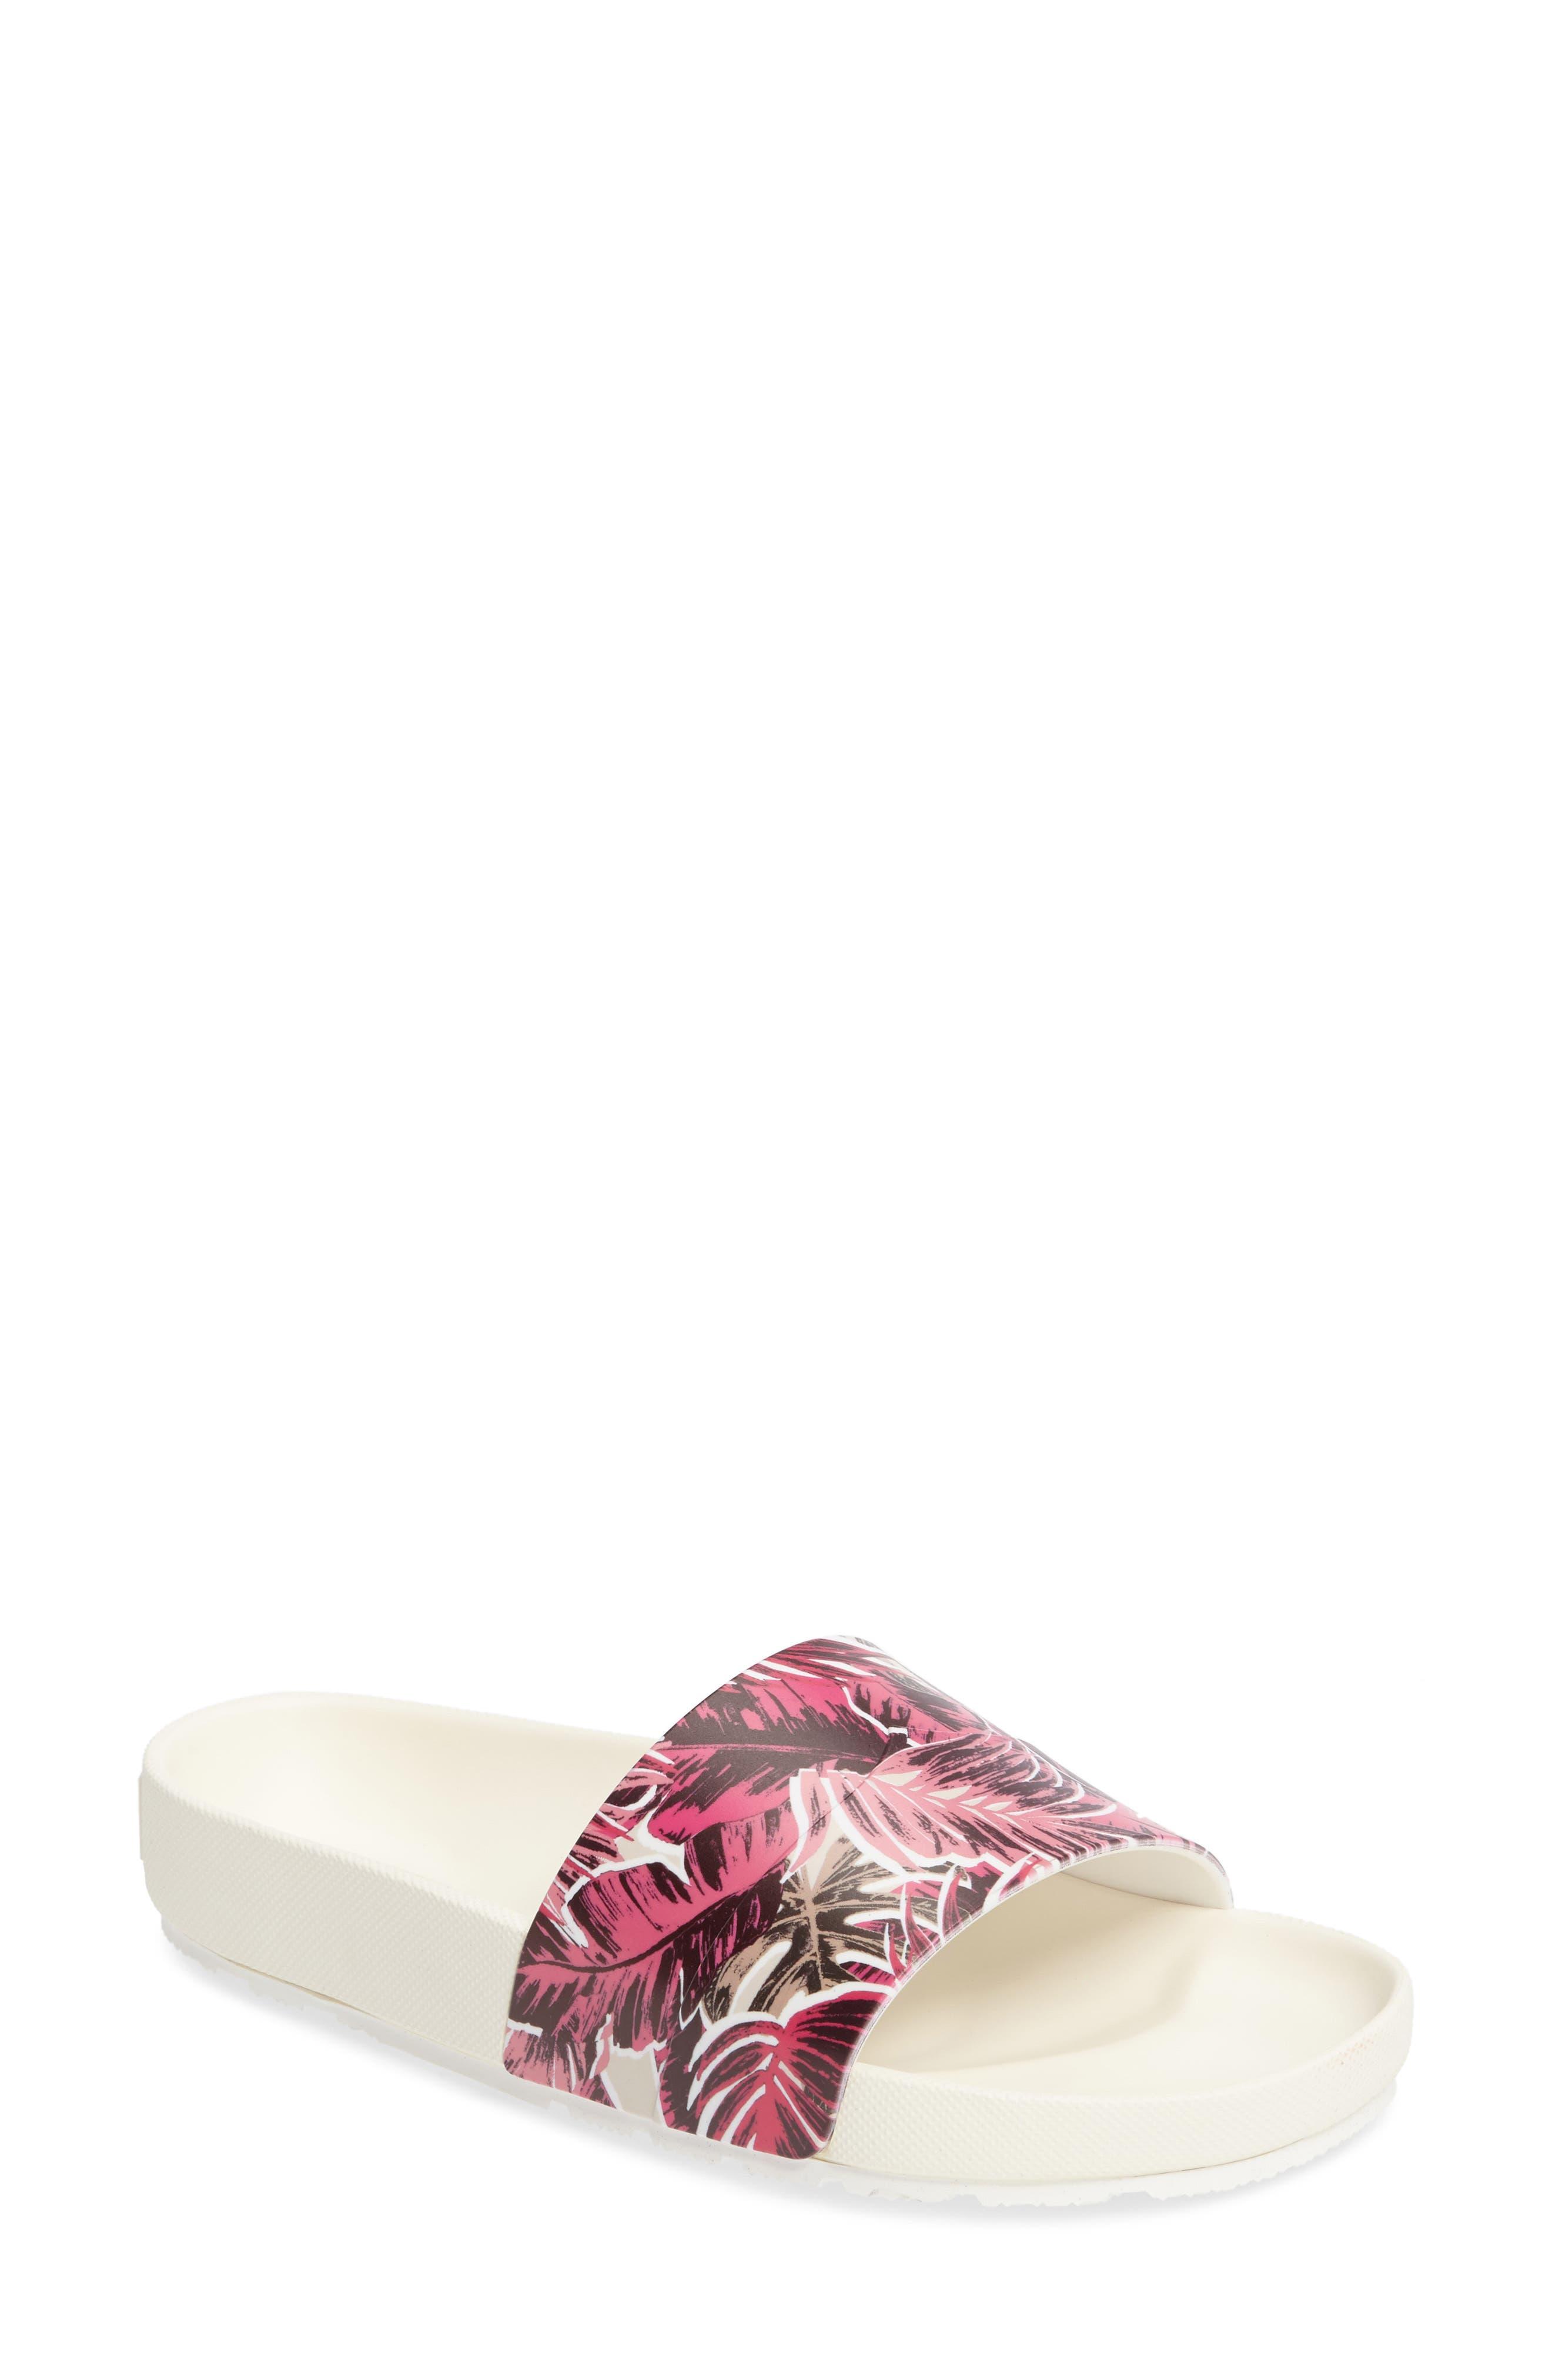 Hunter Original - Jungle Print Slide Sandal (Women)